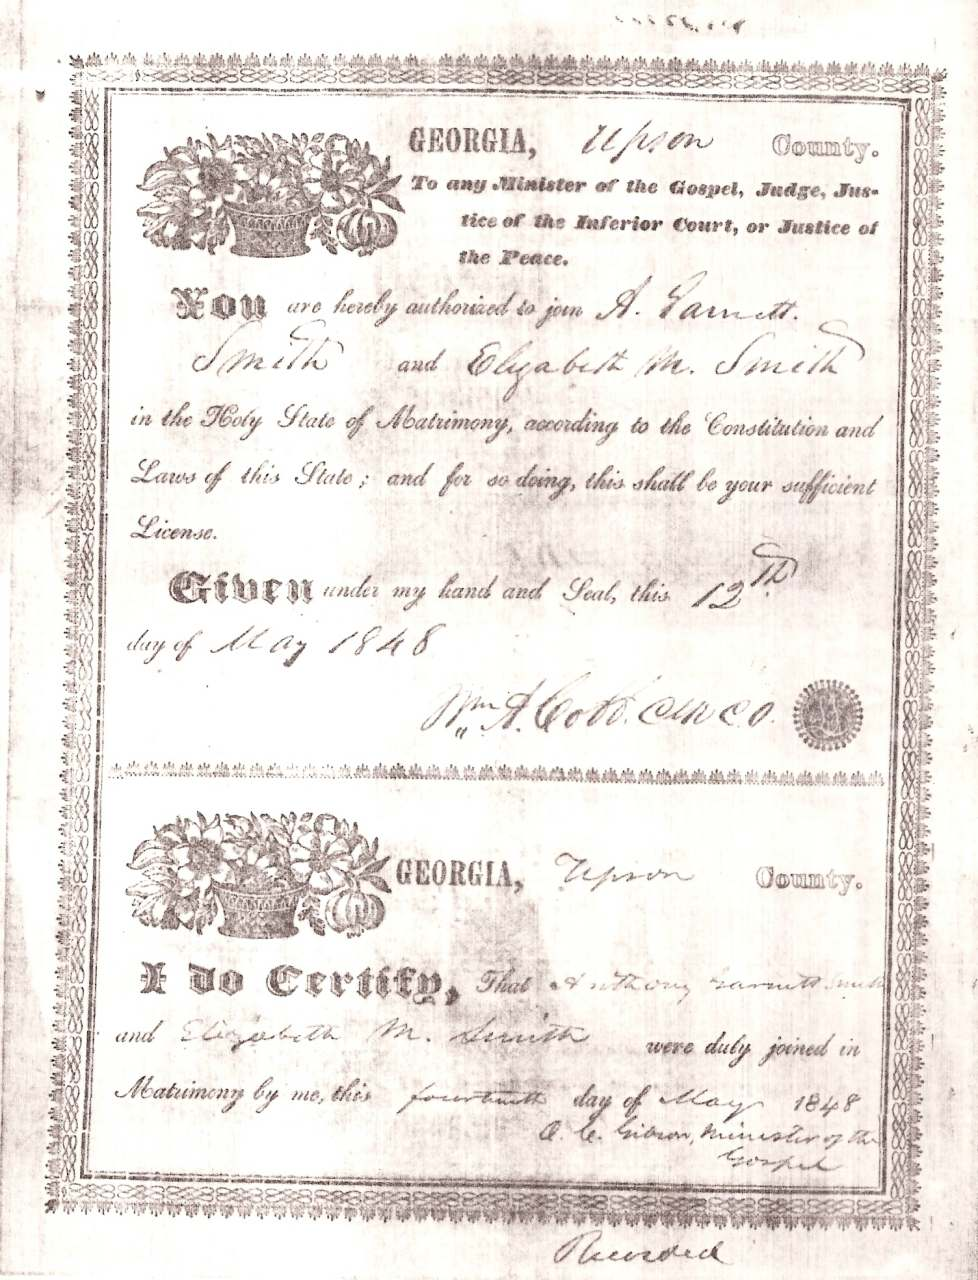 Upson county georgia usgenweb archives smith elizabeth smith anthony garnett marriage certificate may 14 1848 aiddatafo Choice Image